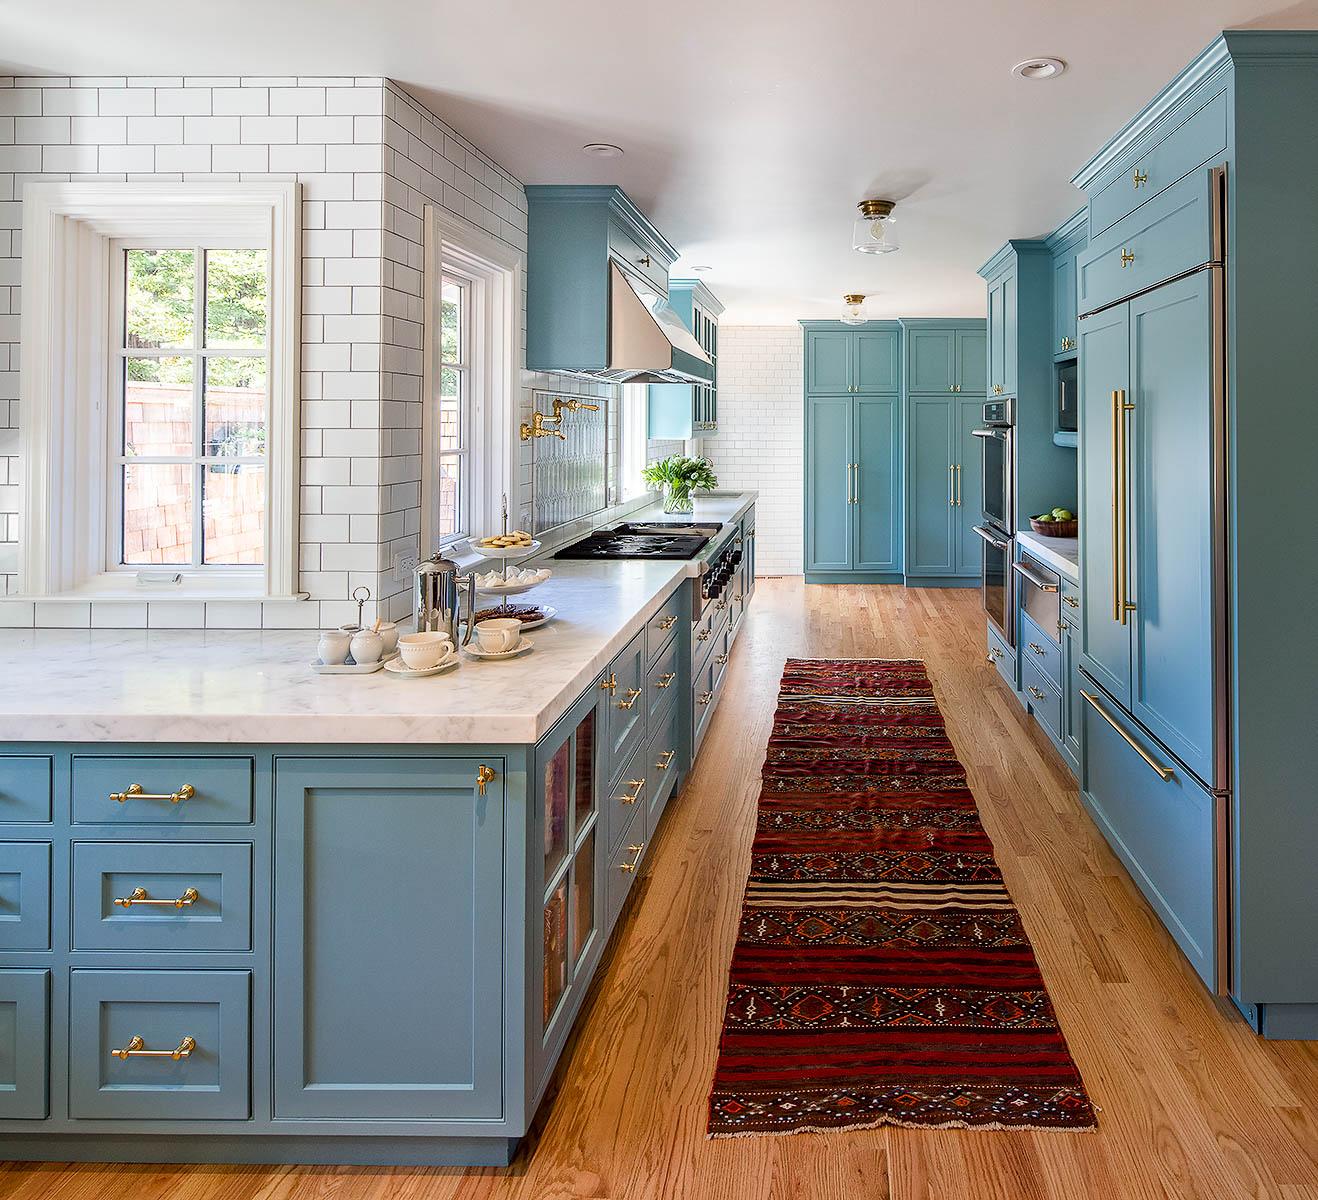 LMB_Interiors_Hillsborough_Green_Design_Kitchen_AFTER_1